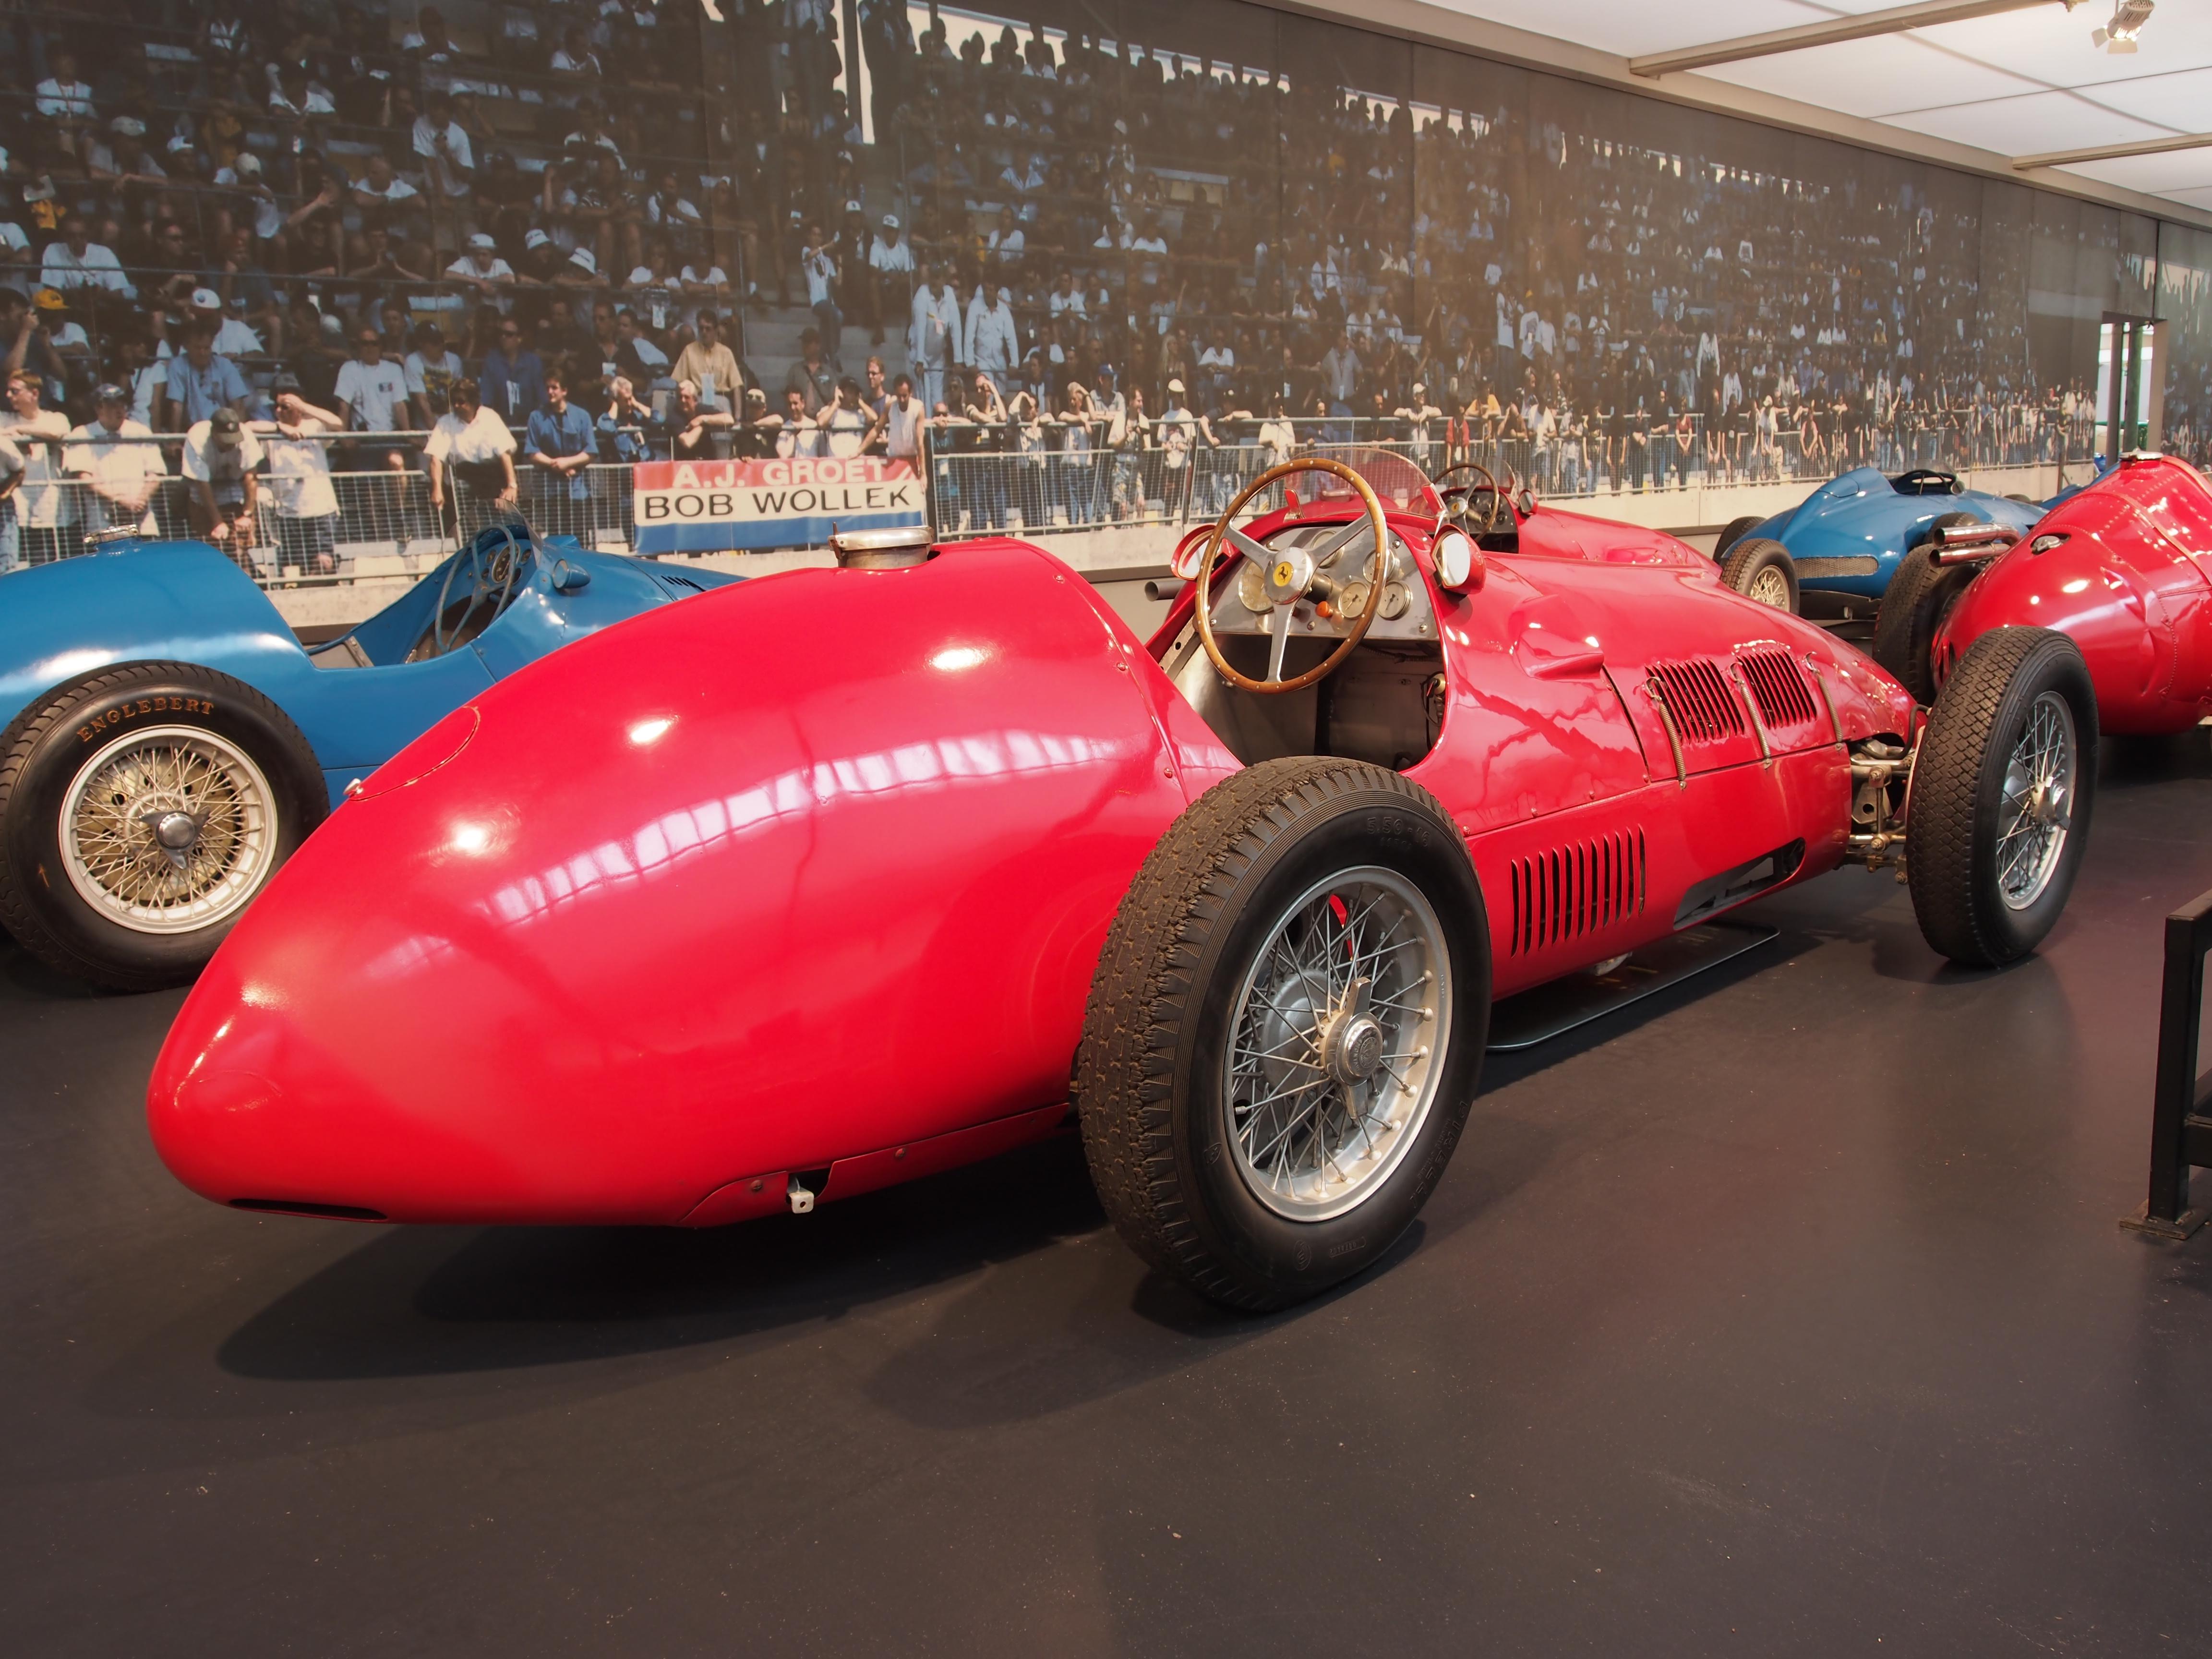 File:1952 Ferrari F2 500-625, 4 cylinder, 185cv, 1984cm3, 220kmh, photo 2.JPG - Wikimedia Commons